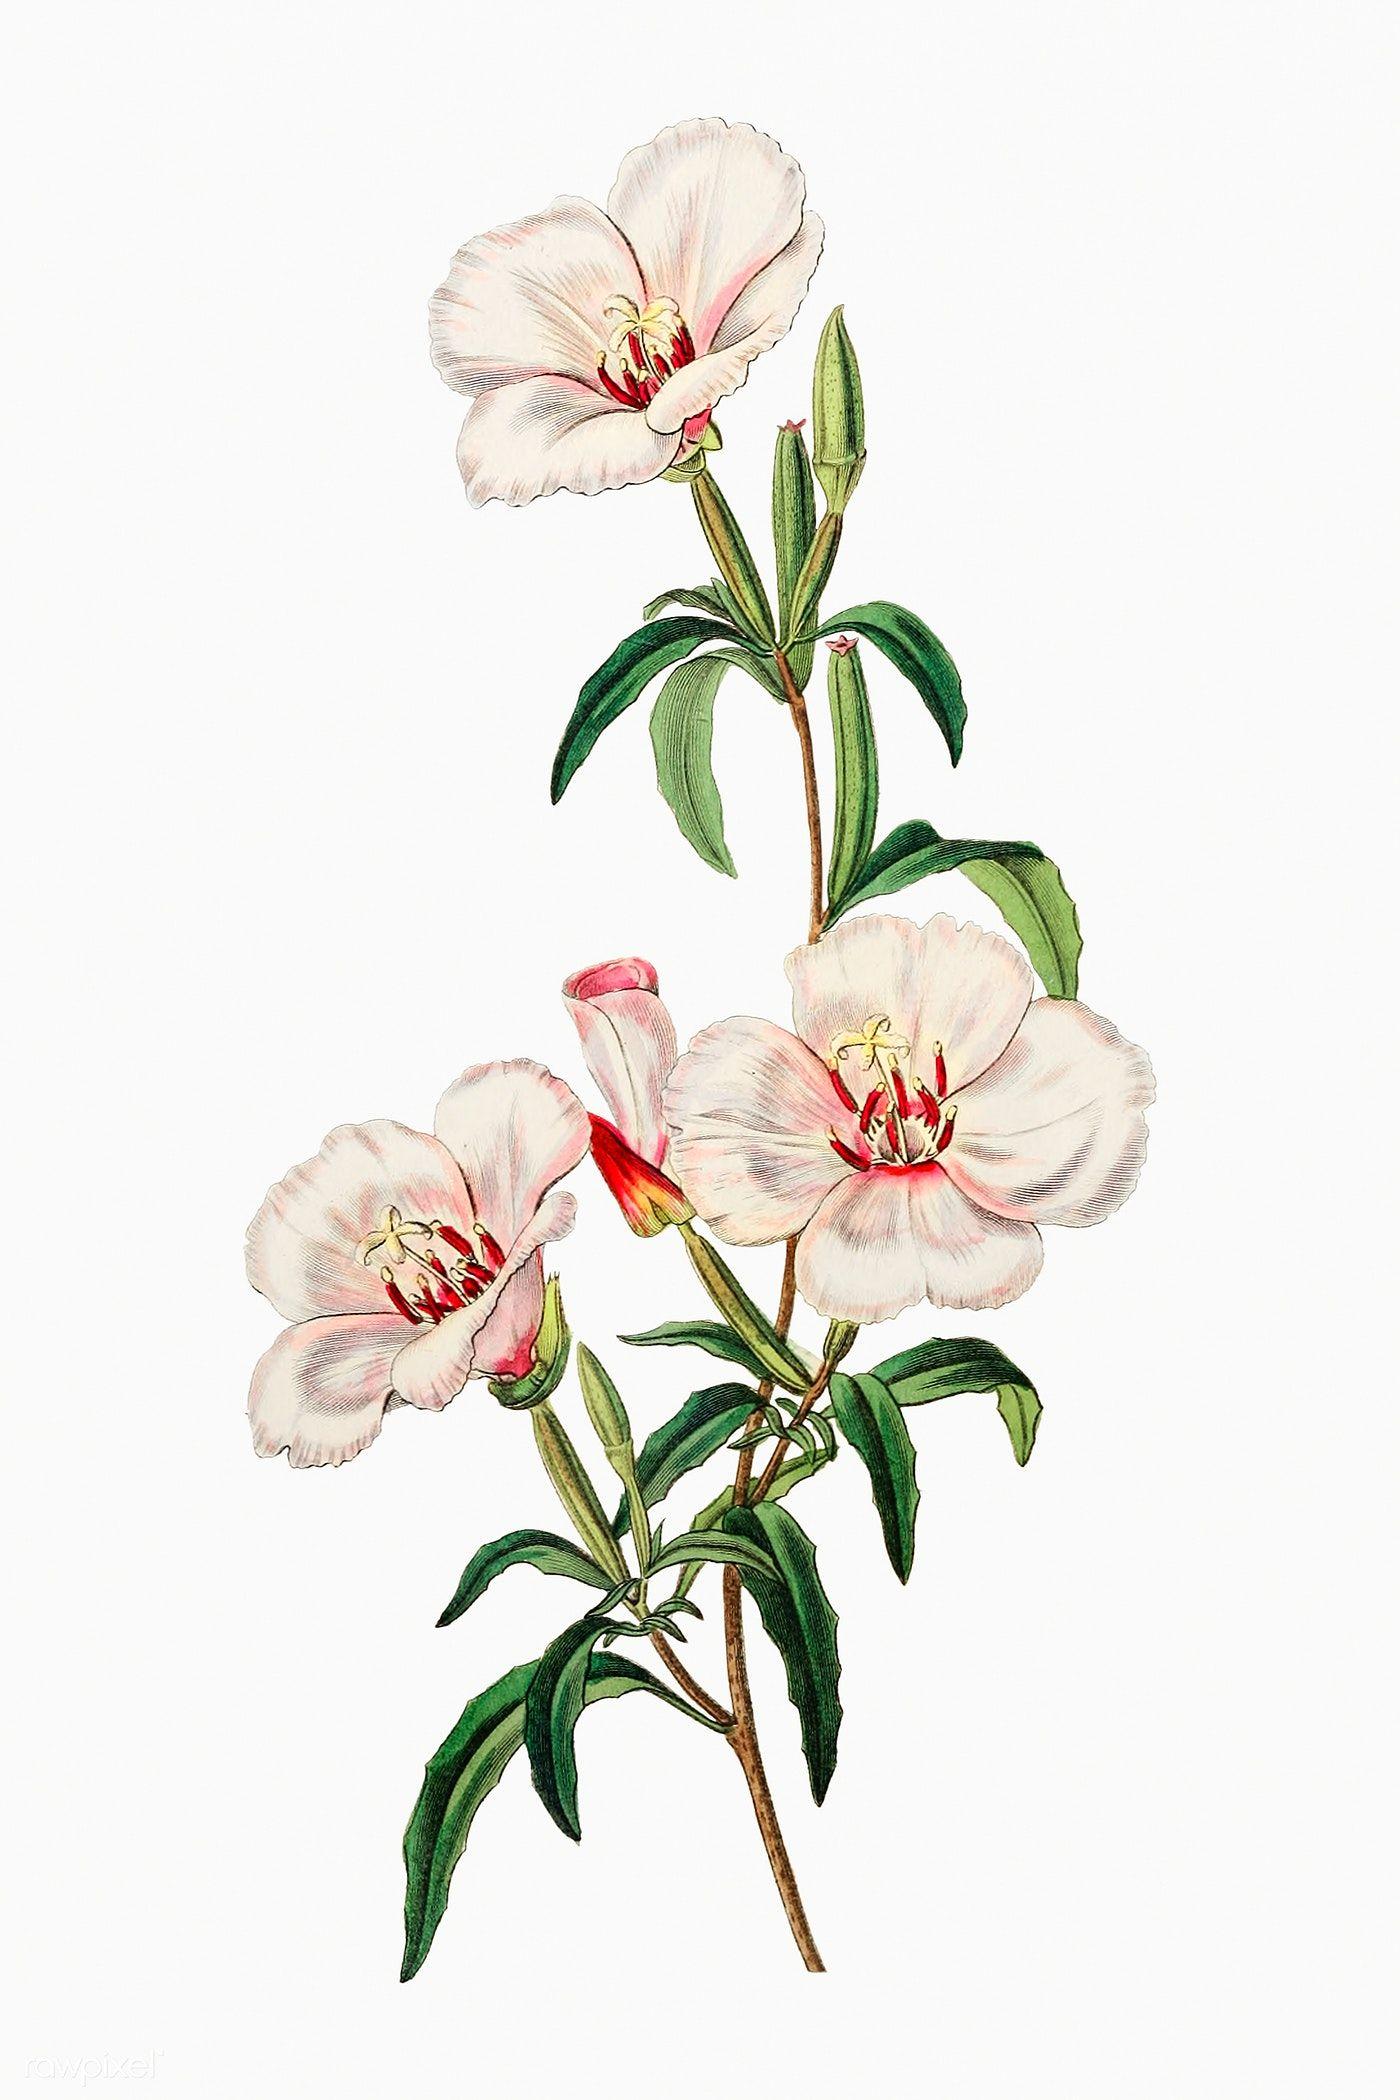 Download Premium Illustration Of Vintage Wine Stained Godetia Flower In 2020 Flower Illustration Digital Flowers Free Illustrations